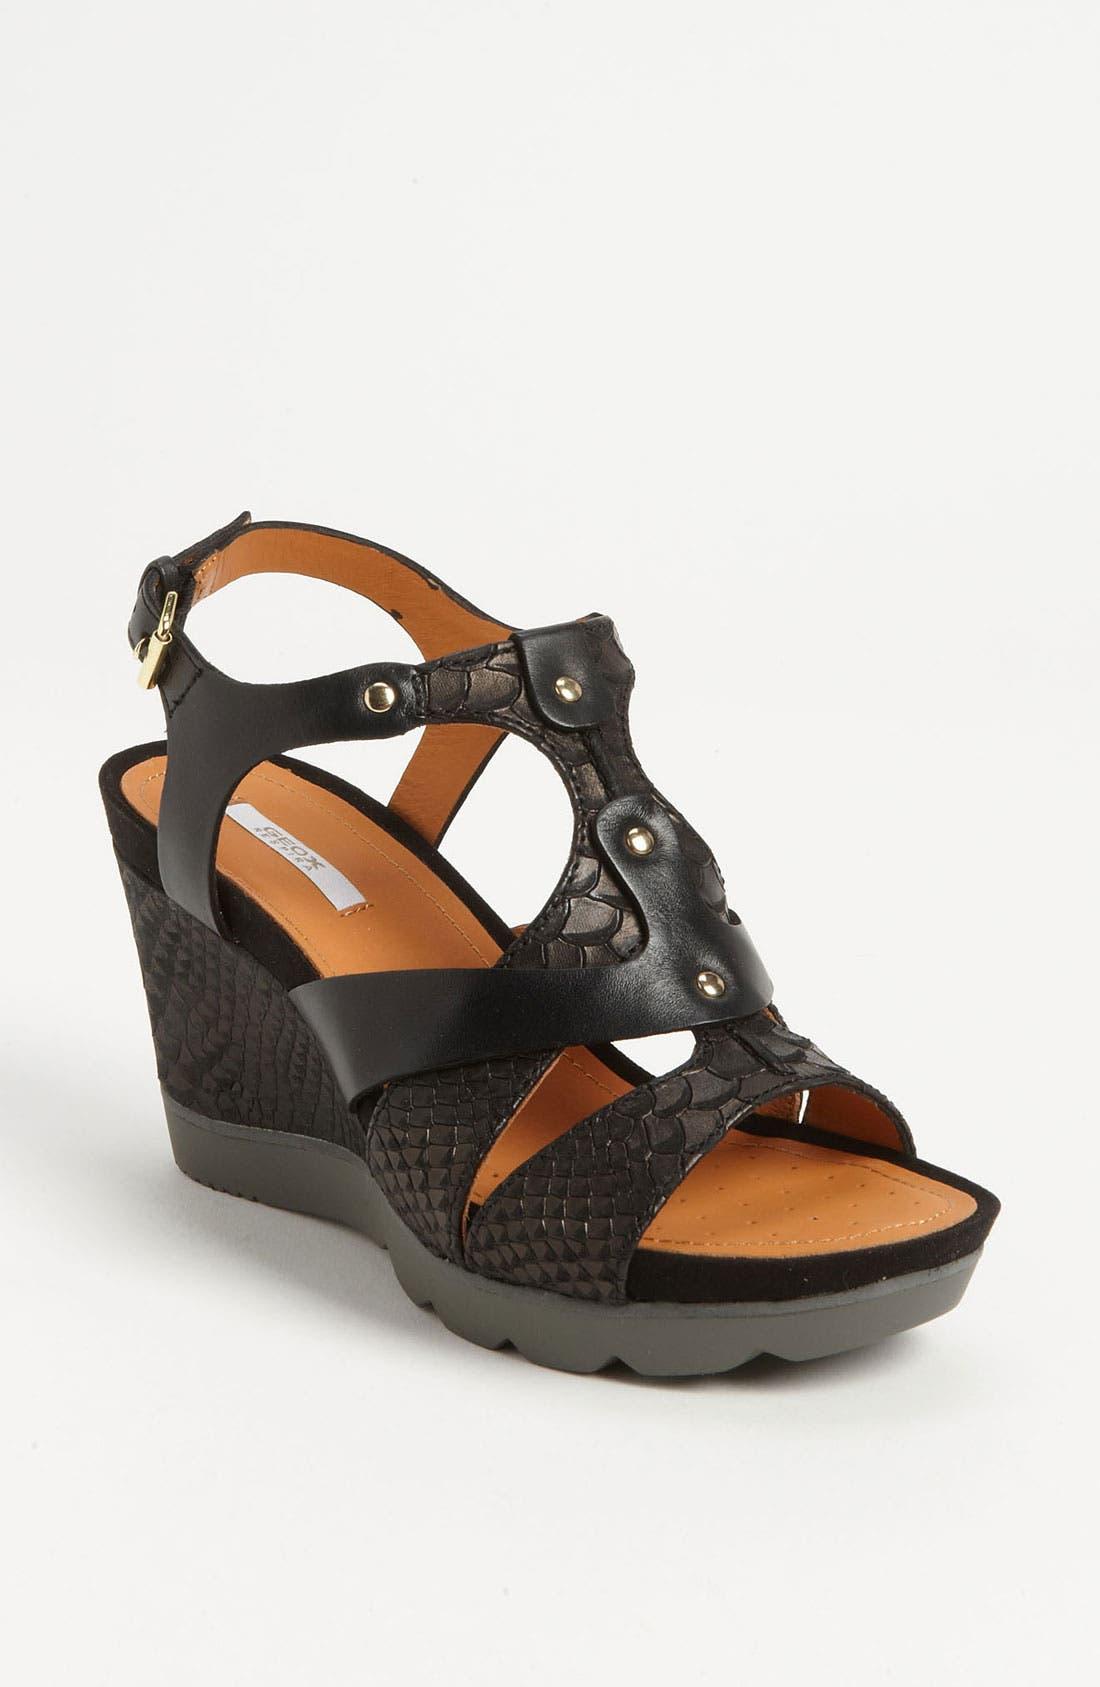 Alternate Image 1 Selected - Geox 'Sophie' Sandal (Online Only)